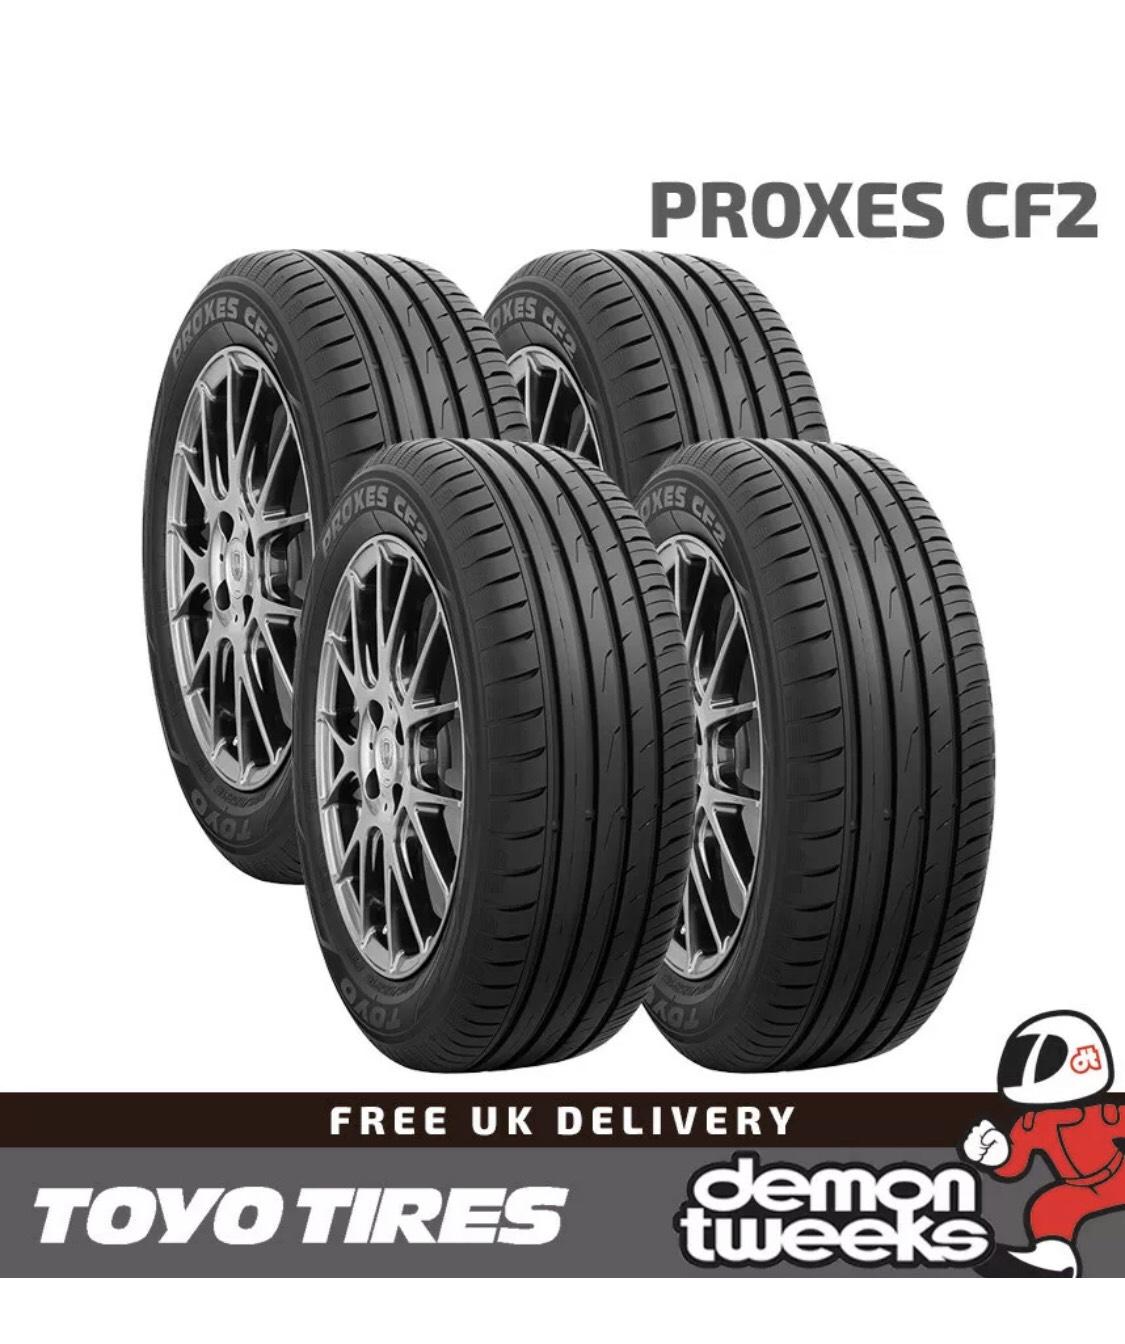 4 x Toyo 195 50 15 82H Proxes CF2 High Performance Road Tyres 1955015 £97.78 at Ebay/DemonTweeks